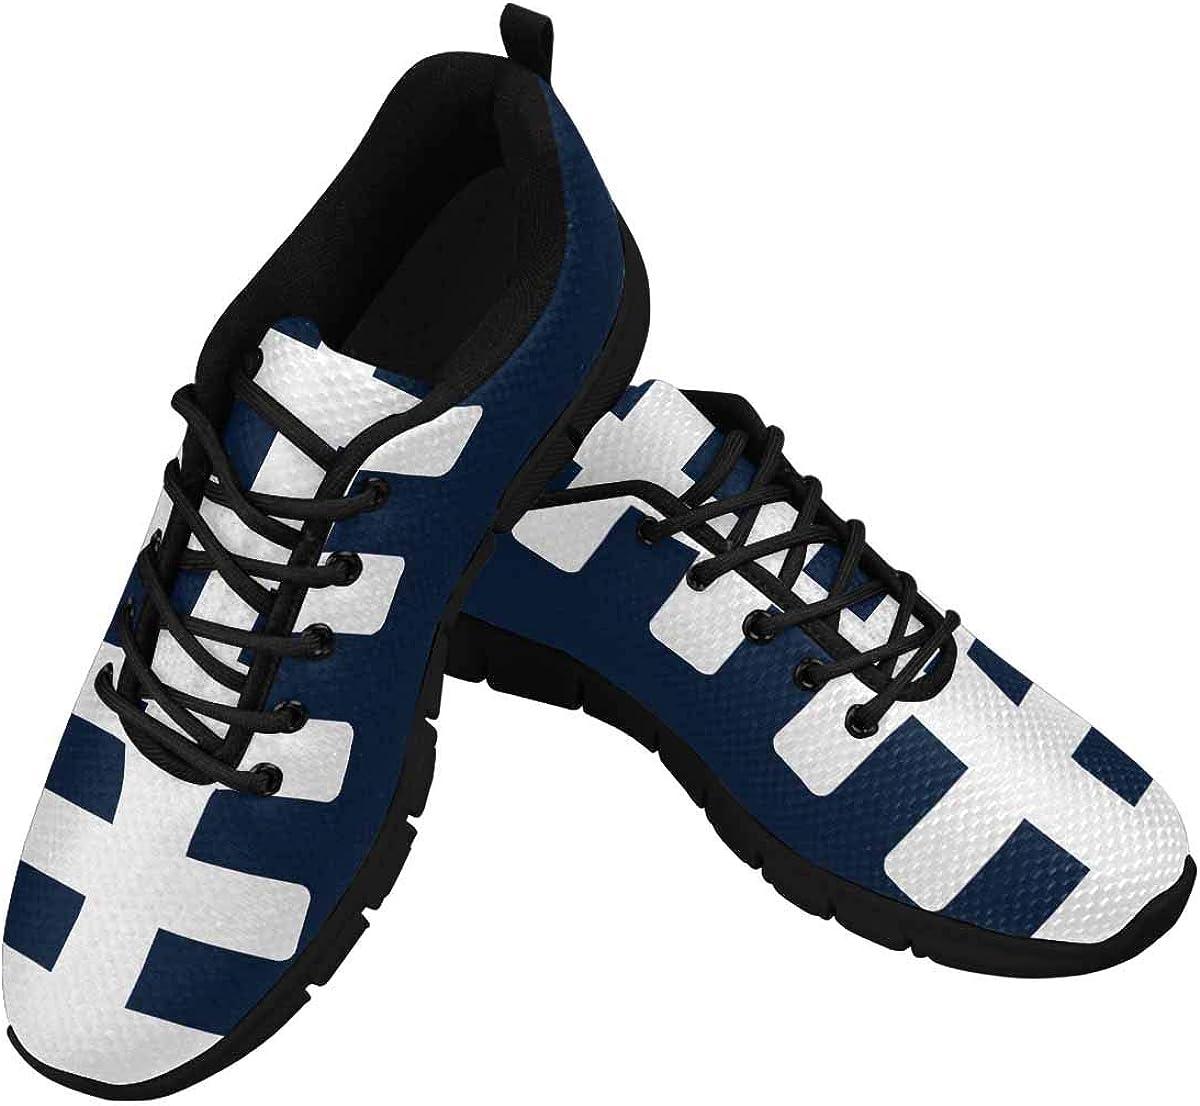 InterestPrint American Football Field Sports Navy Blue Women's Walking Shoes Lightweight Casual Running Sneakers